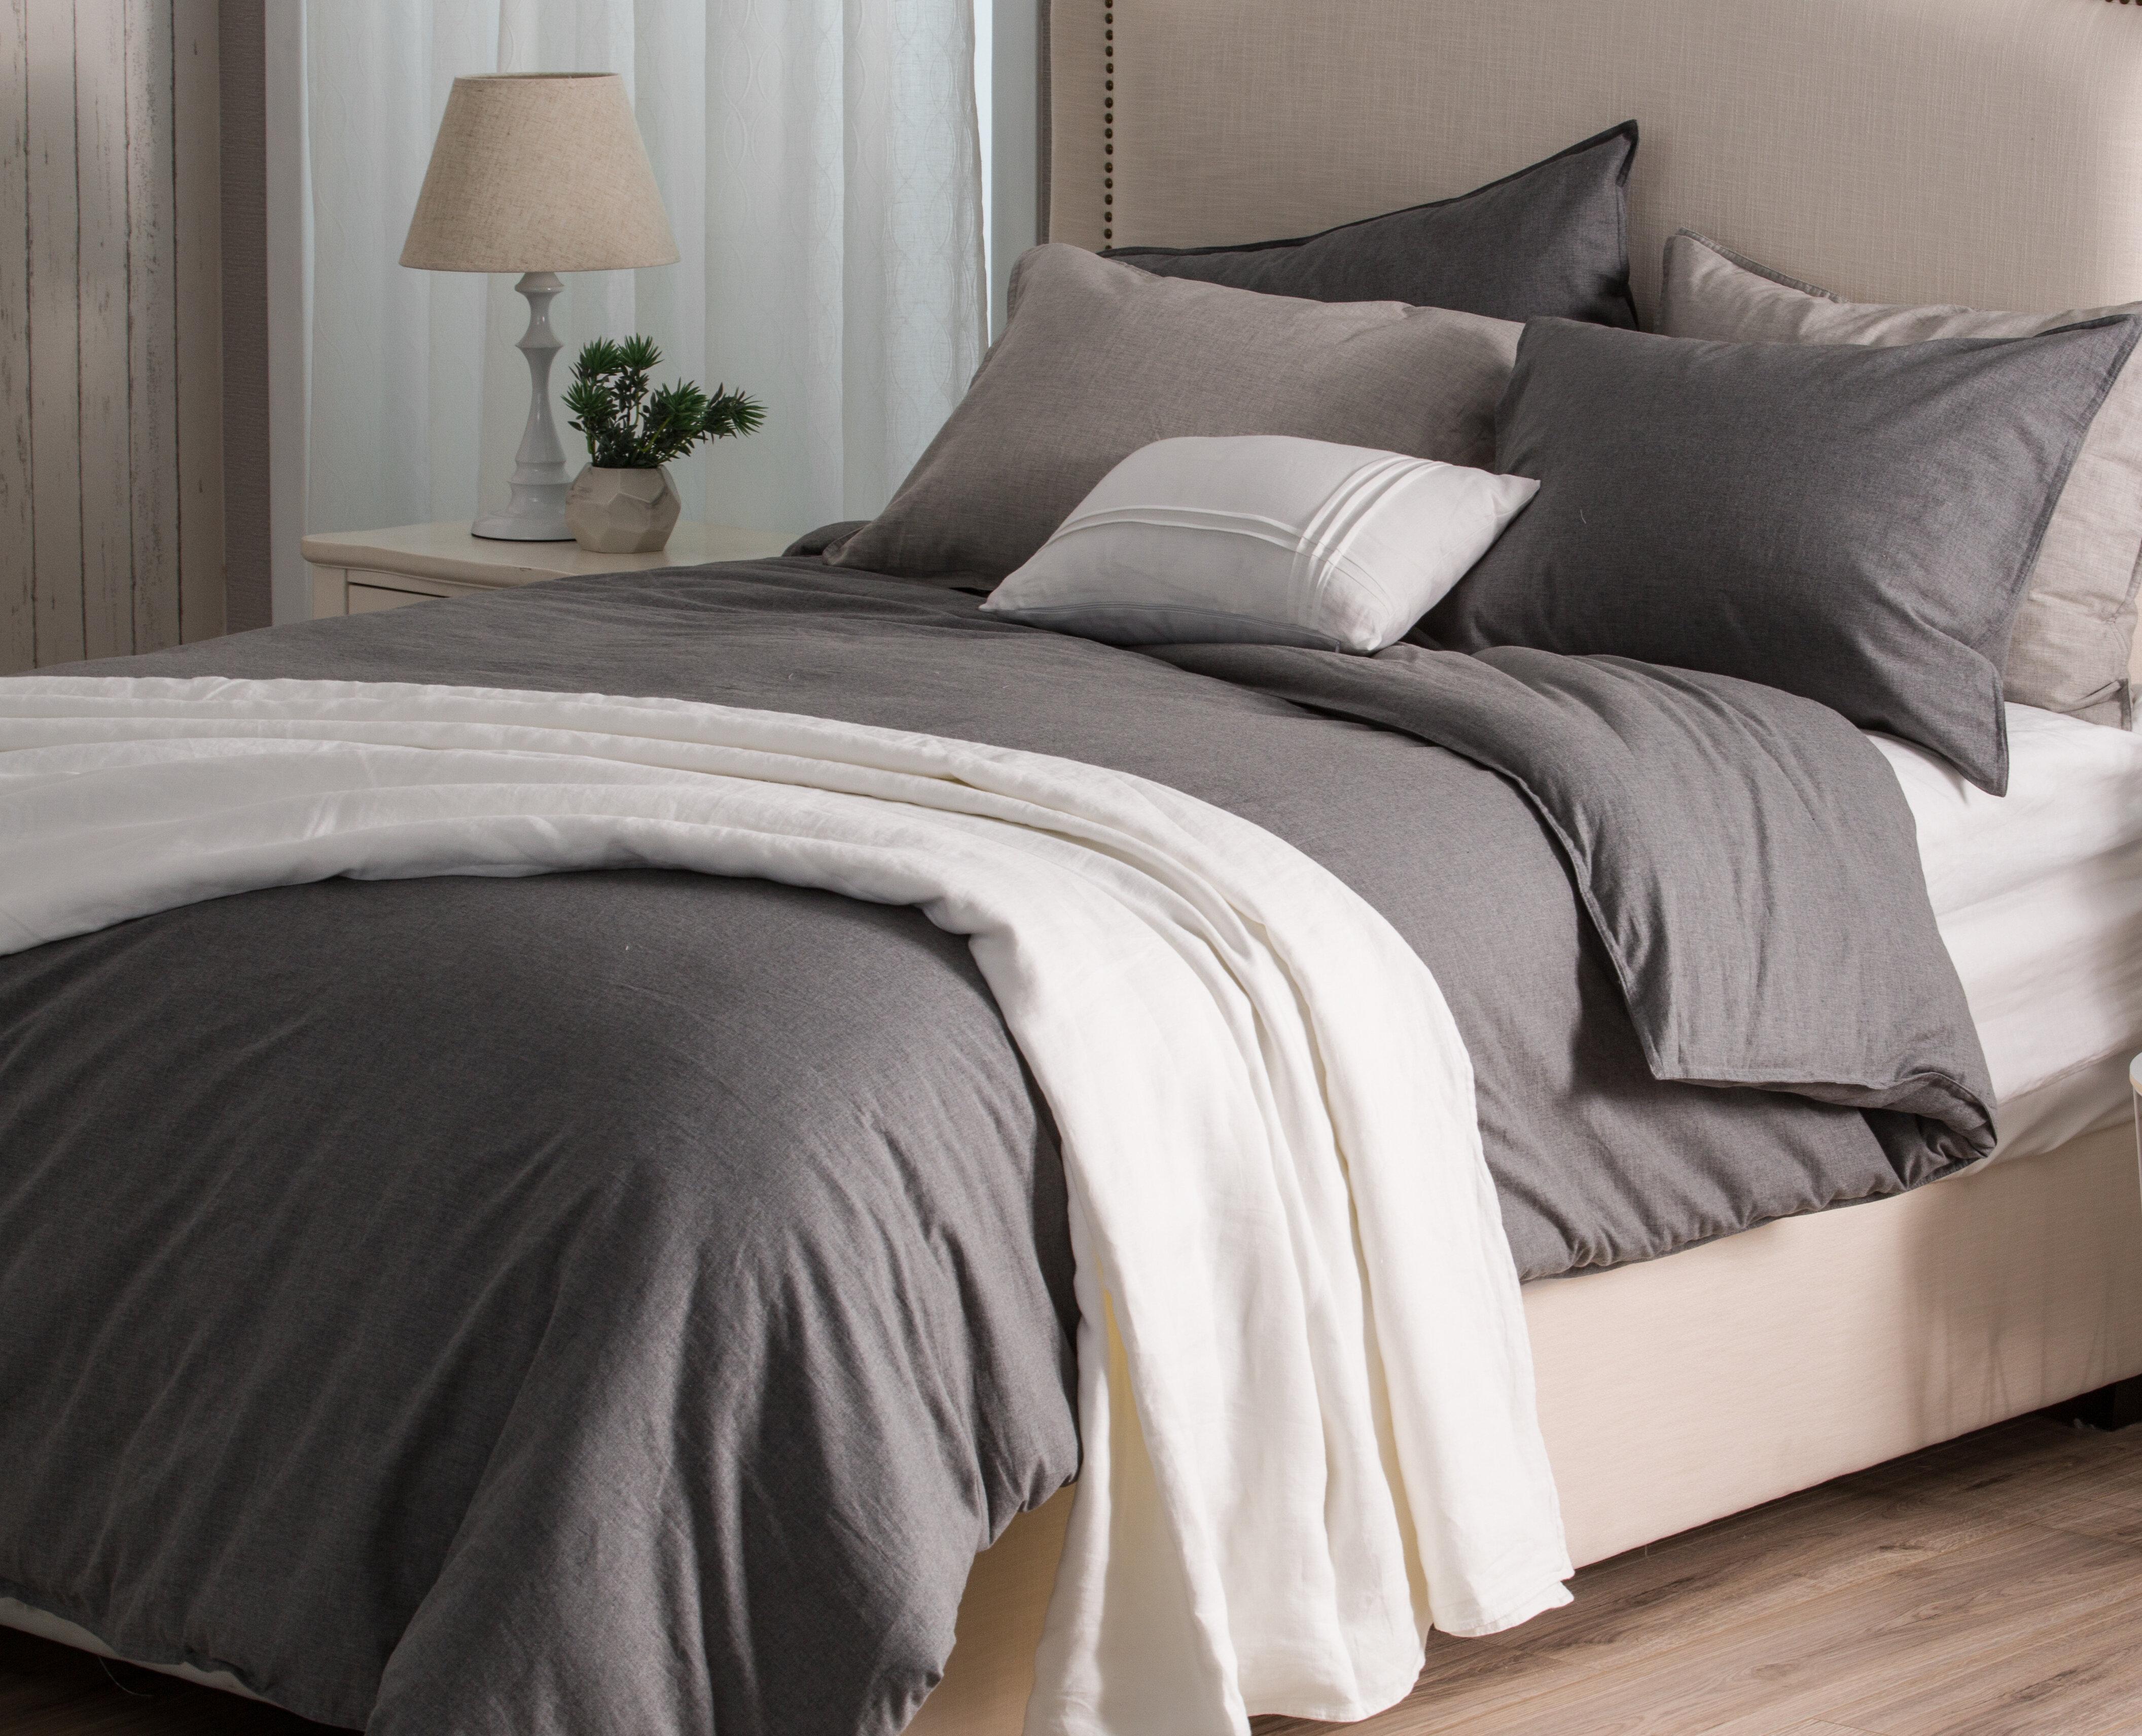 Canora Grey Heathered Cotton Melange 3pcs Duvet Cover With Matching Pillow Shams Light Grey Queen Reviews Wayfair Ca